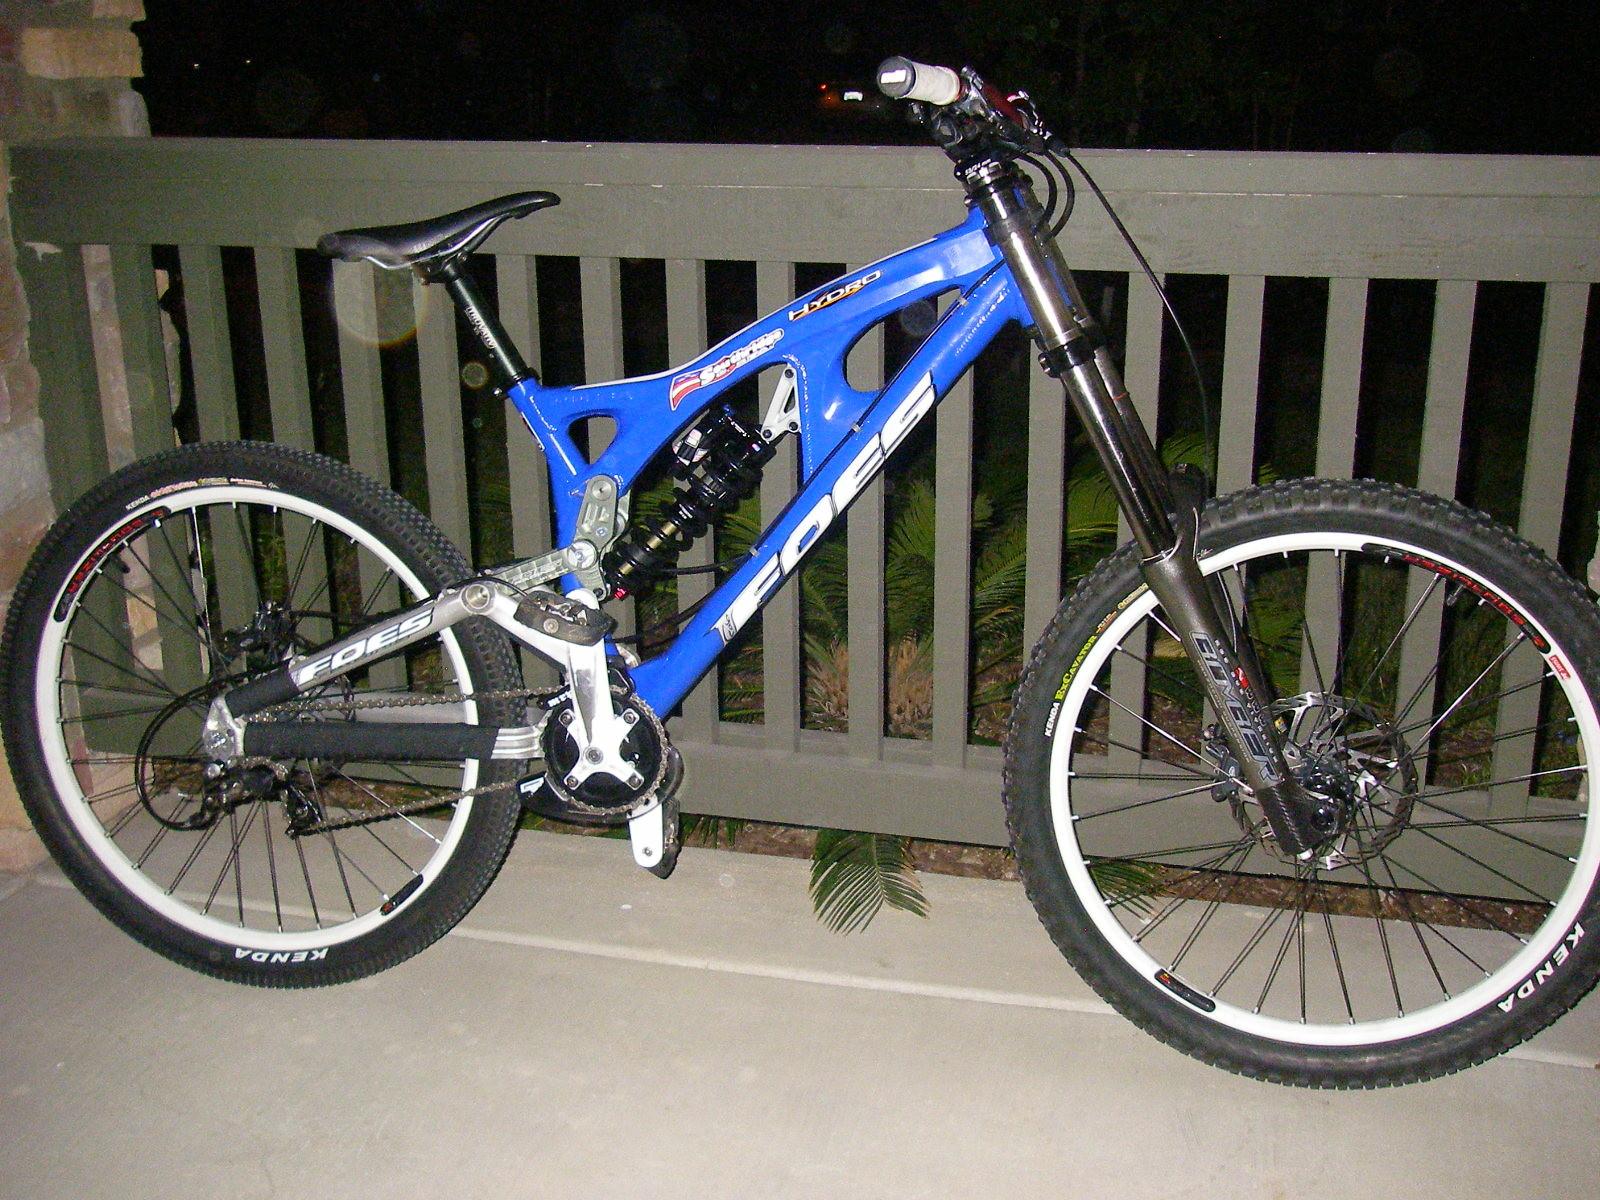 P5190120 - Dereka15 - Mountain Biking Pictures - Vital MTB